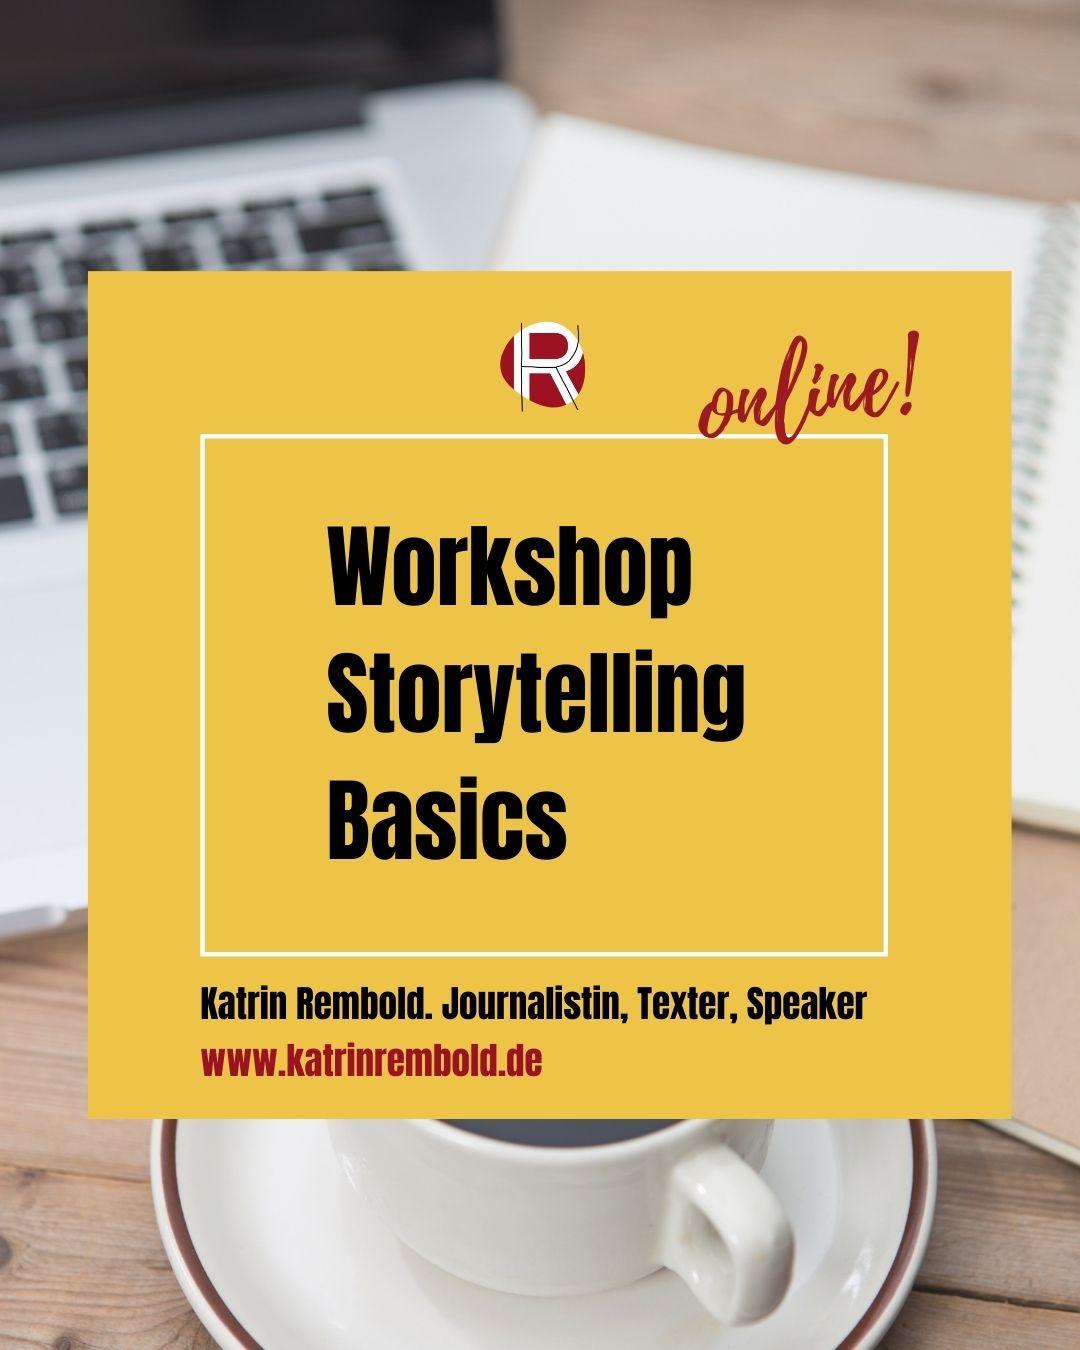 Katrin Rembold, Journalistin & Texterin. Online Workshop Storytelling Basics für Social Media